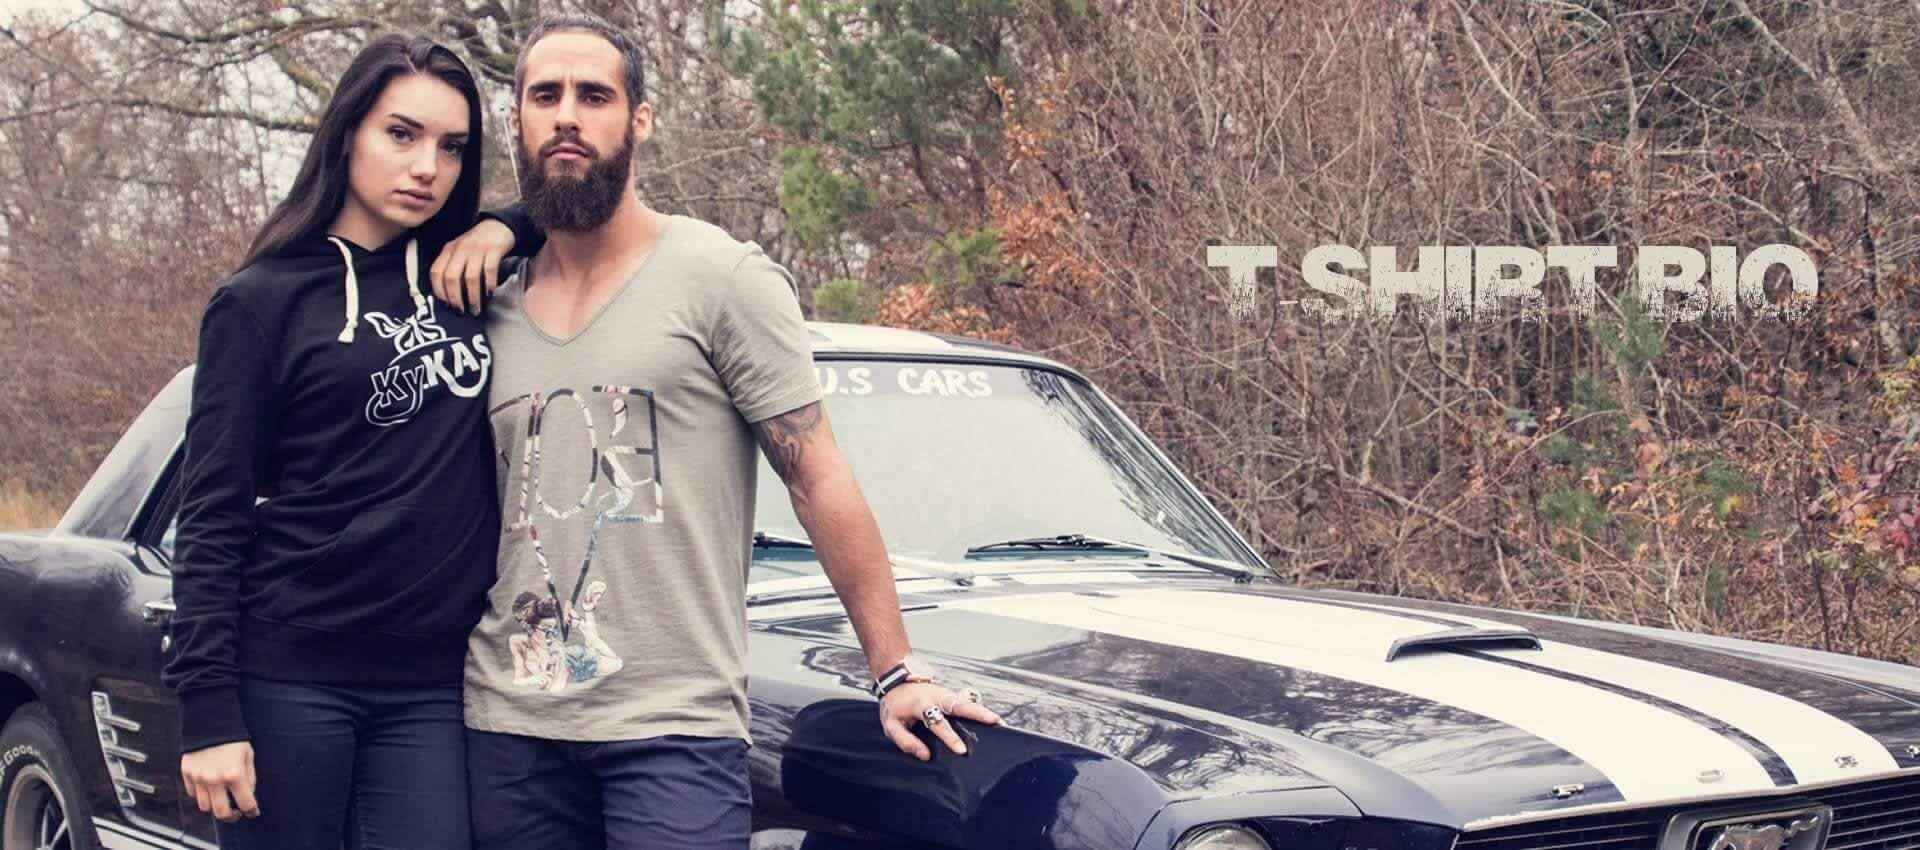 Vêtements sportswear streetwear hip hop rap swagg élégant urban skate surf hommes femmes